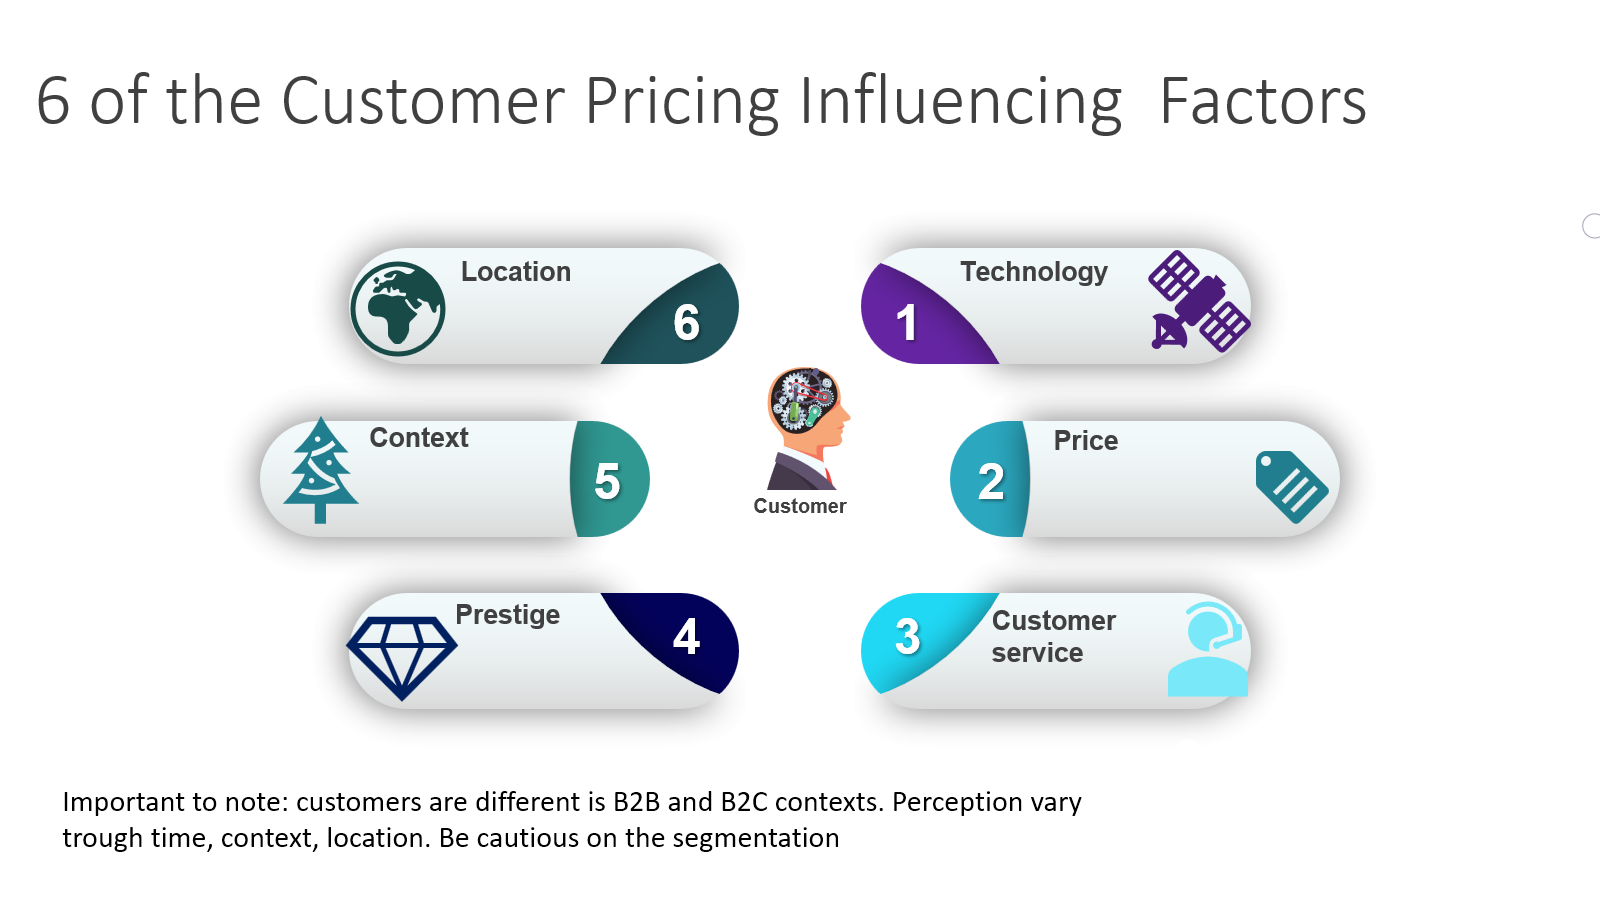 Pricing influencing factors